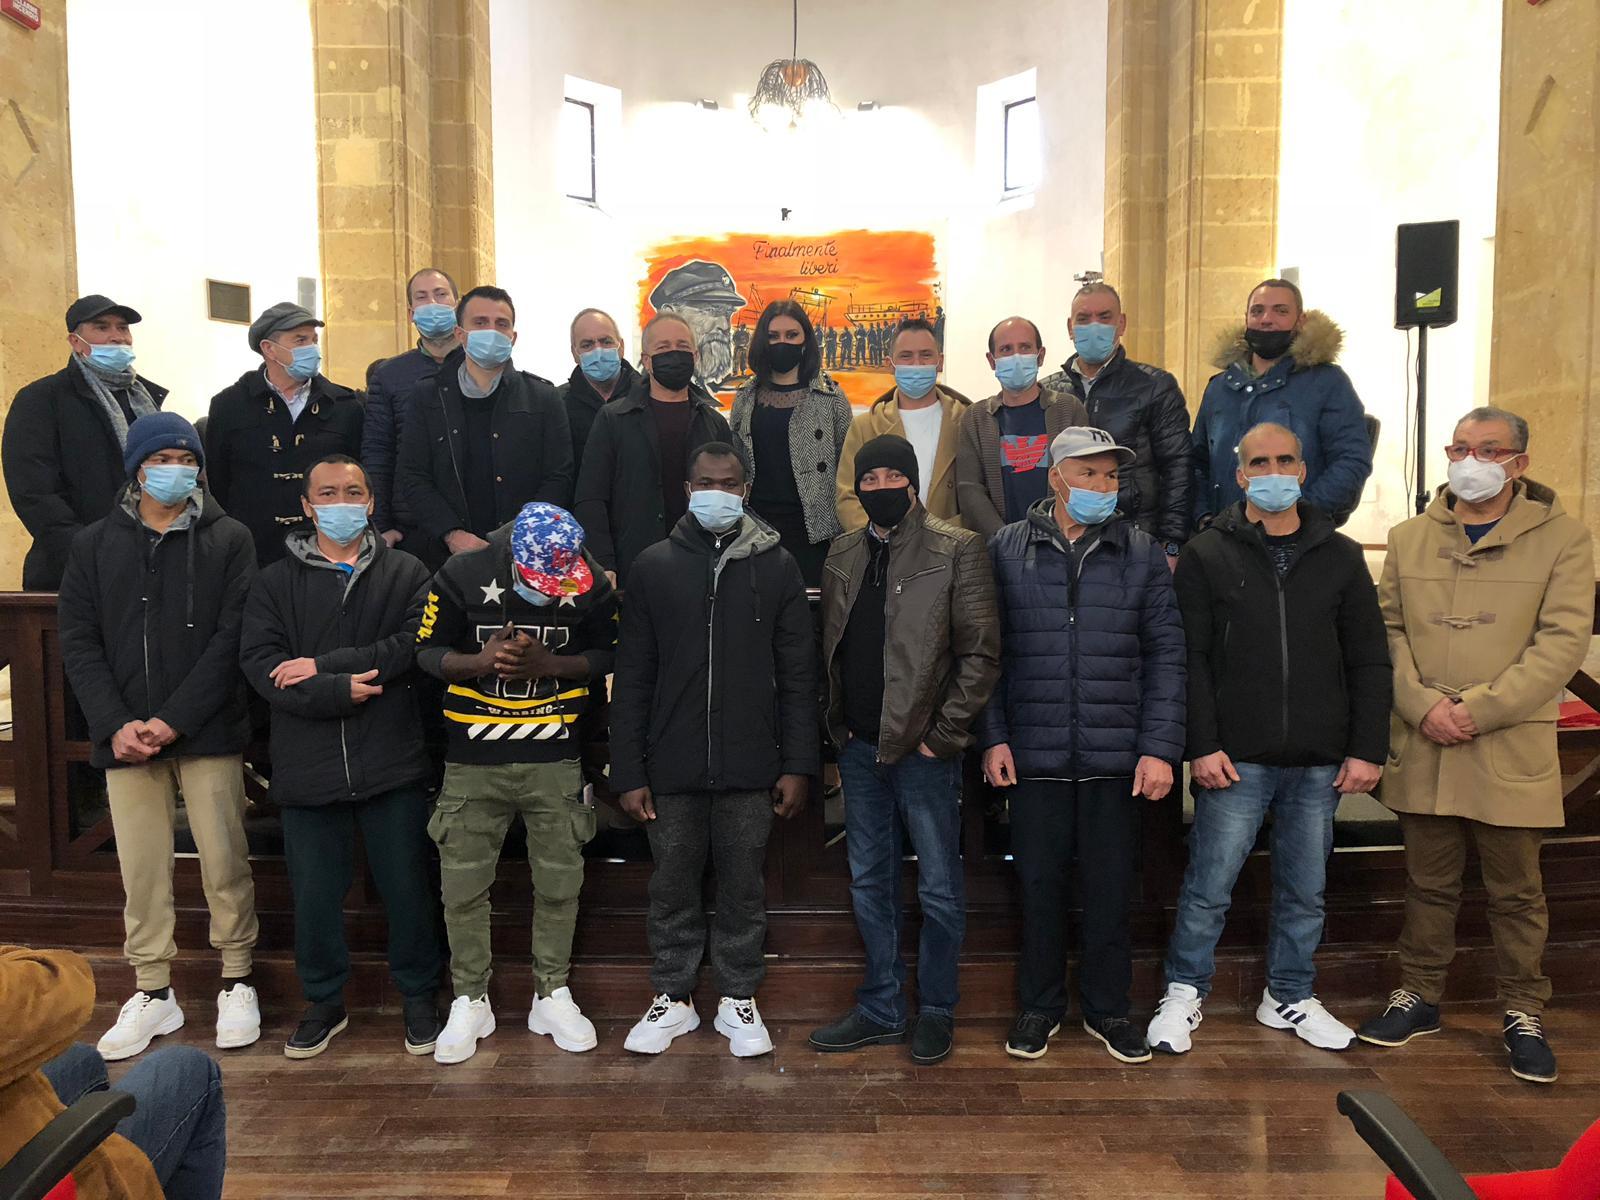 L'artista mazarese Manuela Marascia incontra i 18 pescatori e consegna l'opera